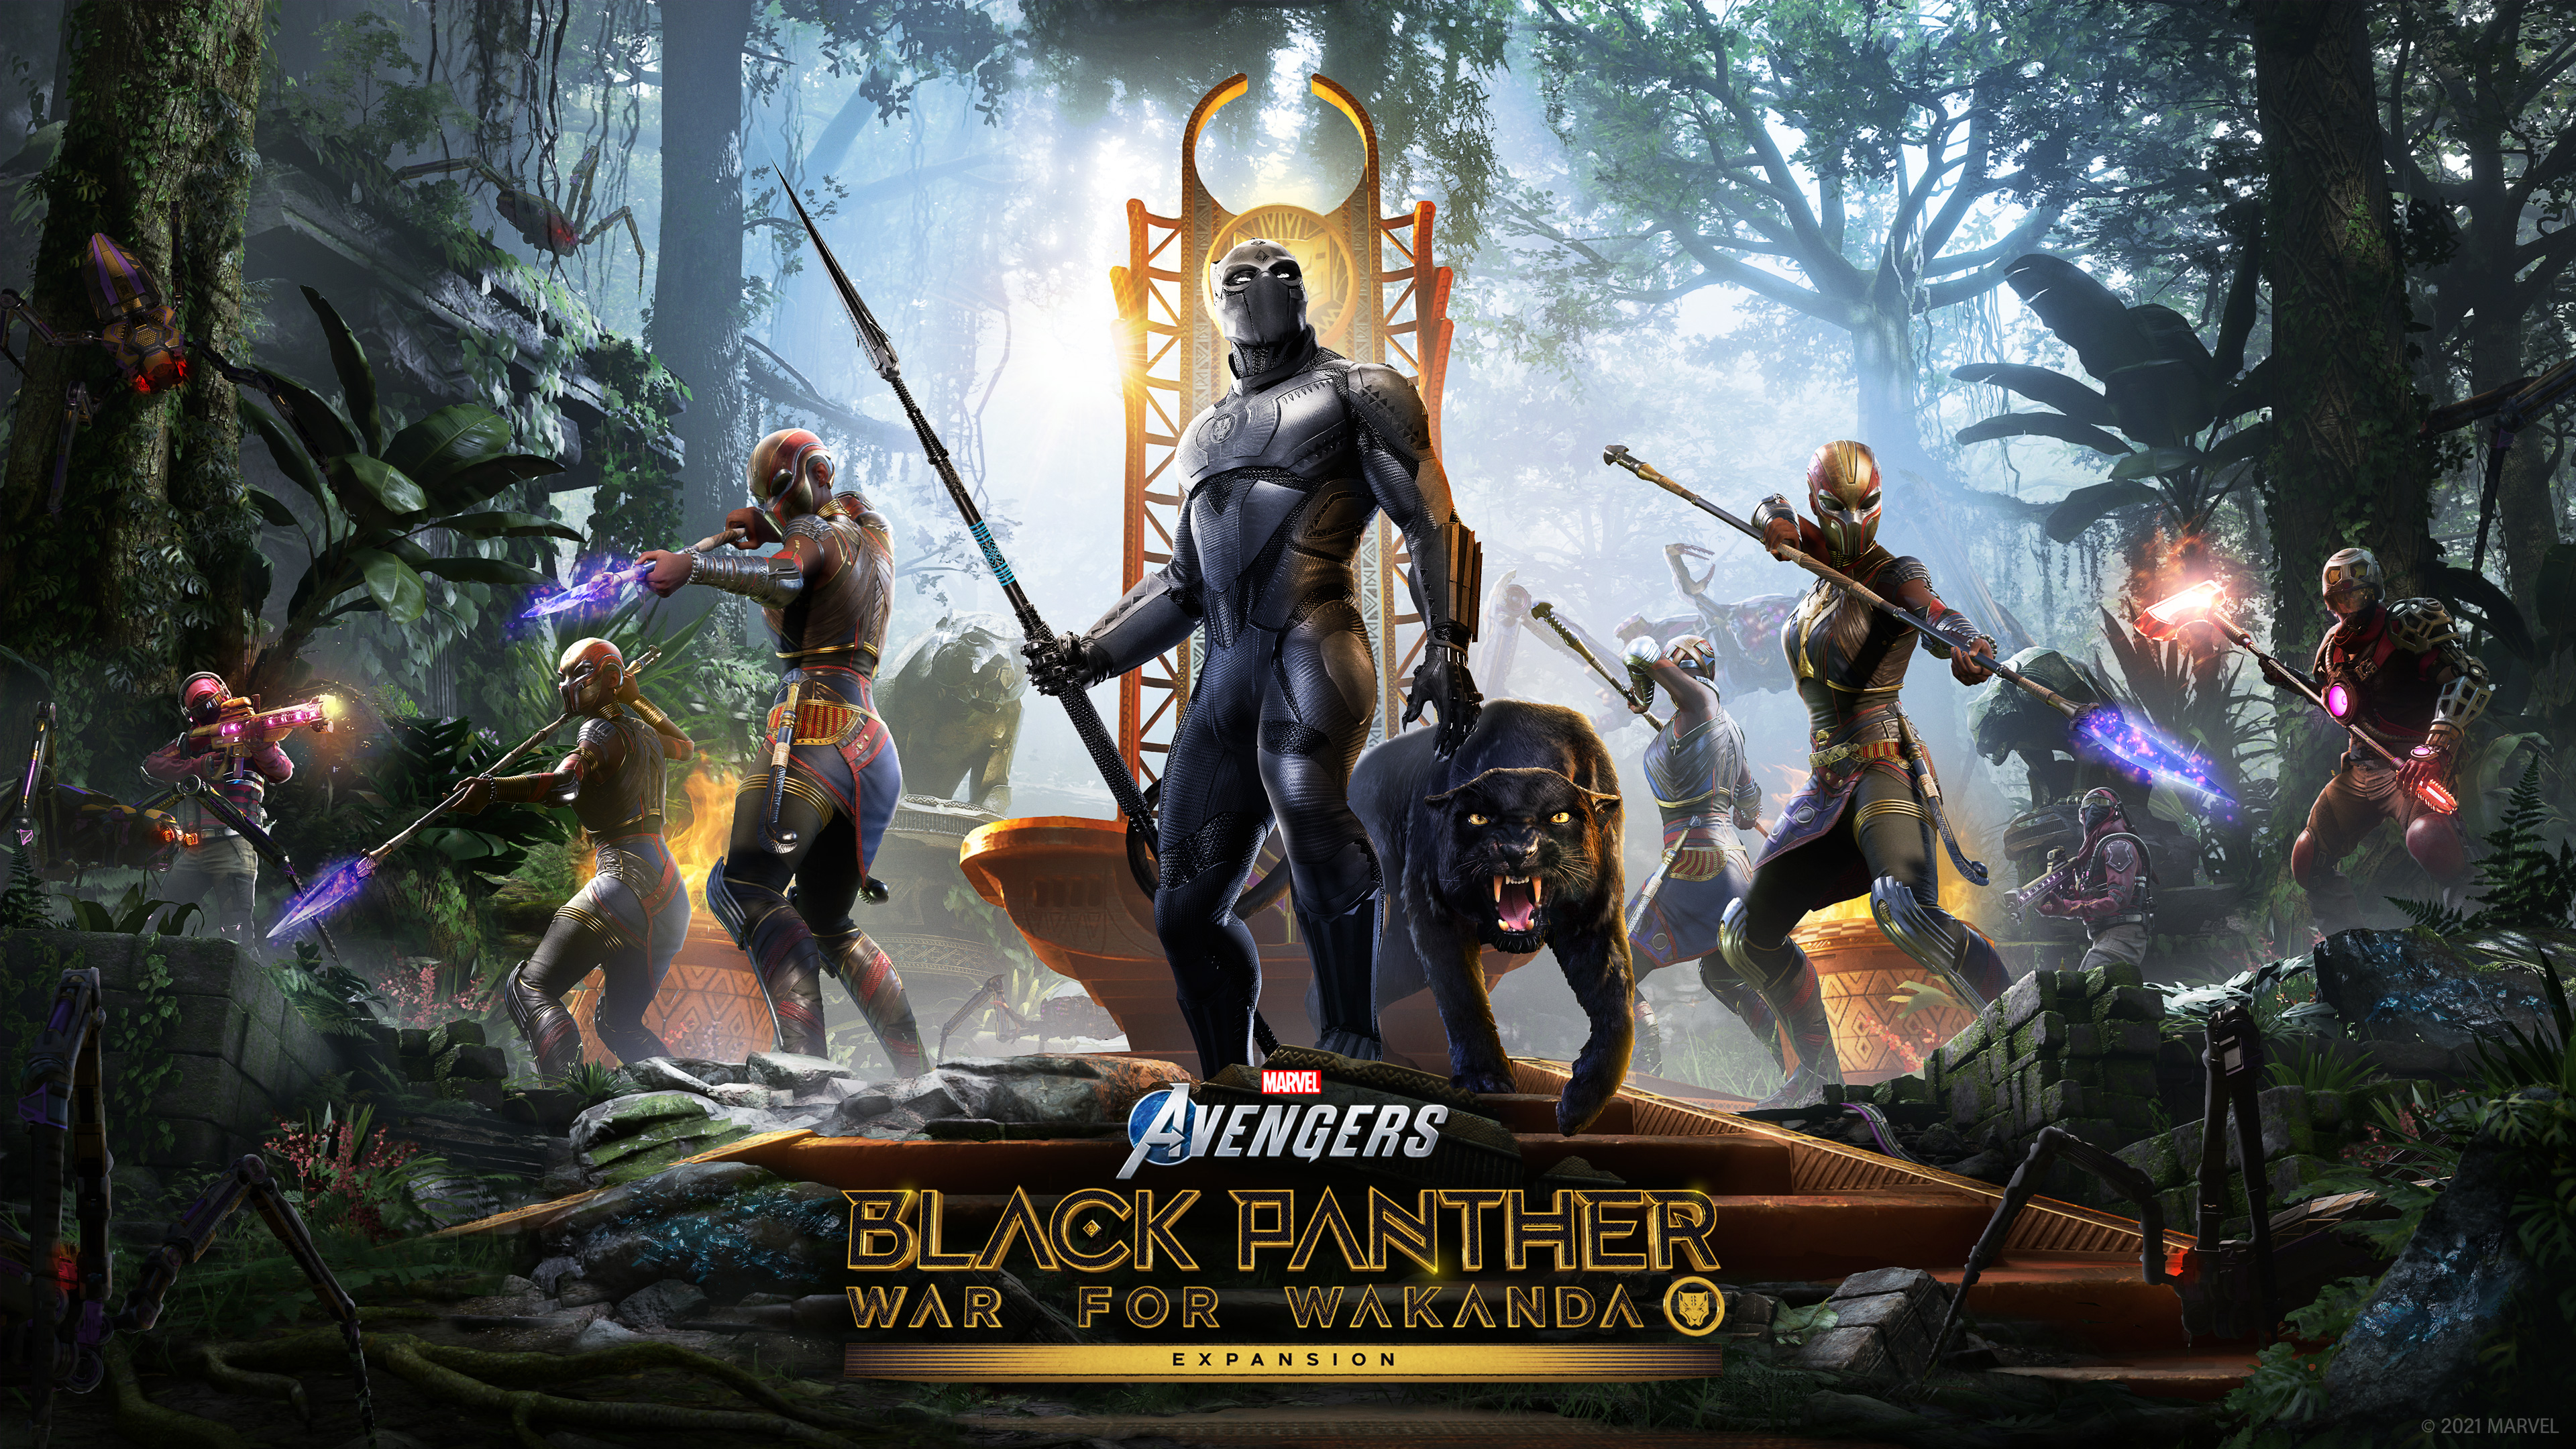 'Marvel's Avengers' Black Panther: War For Wankda Release Date Revealed